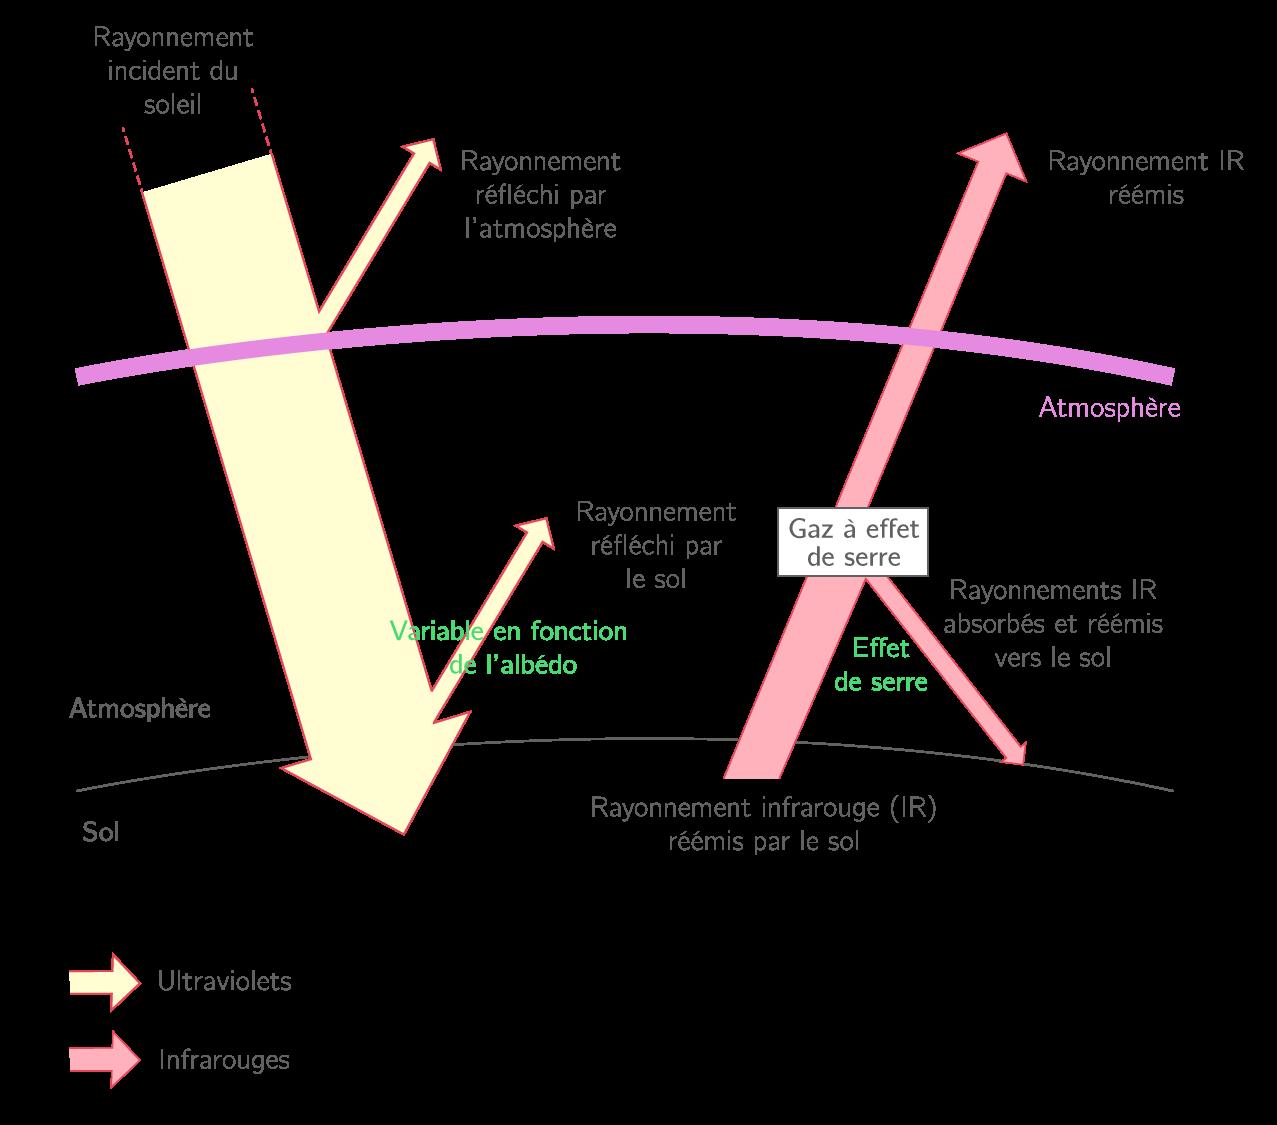 Schématisation de l'effet de serre